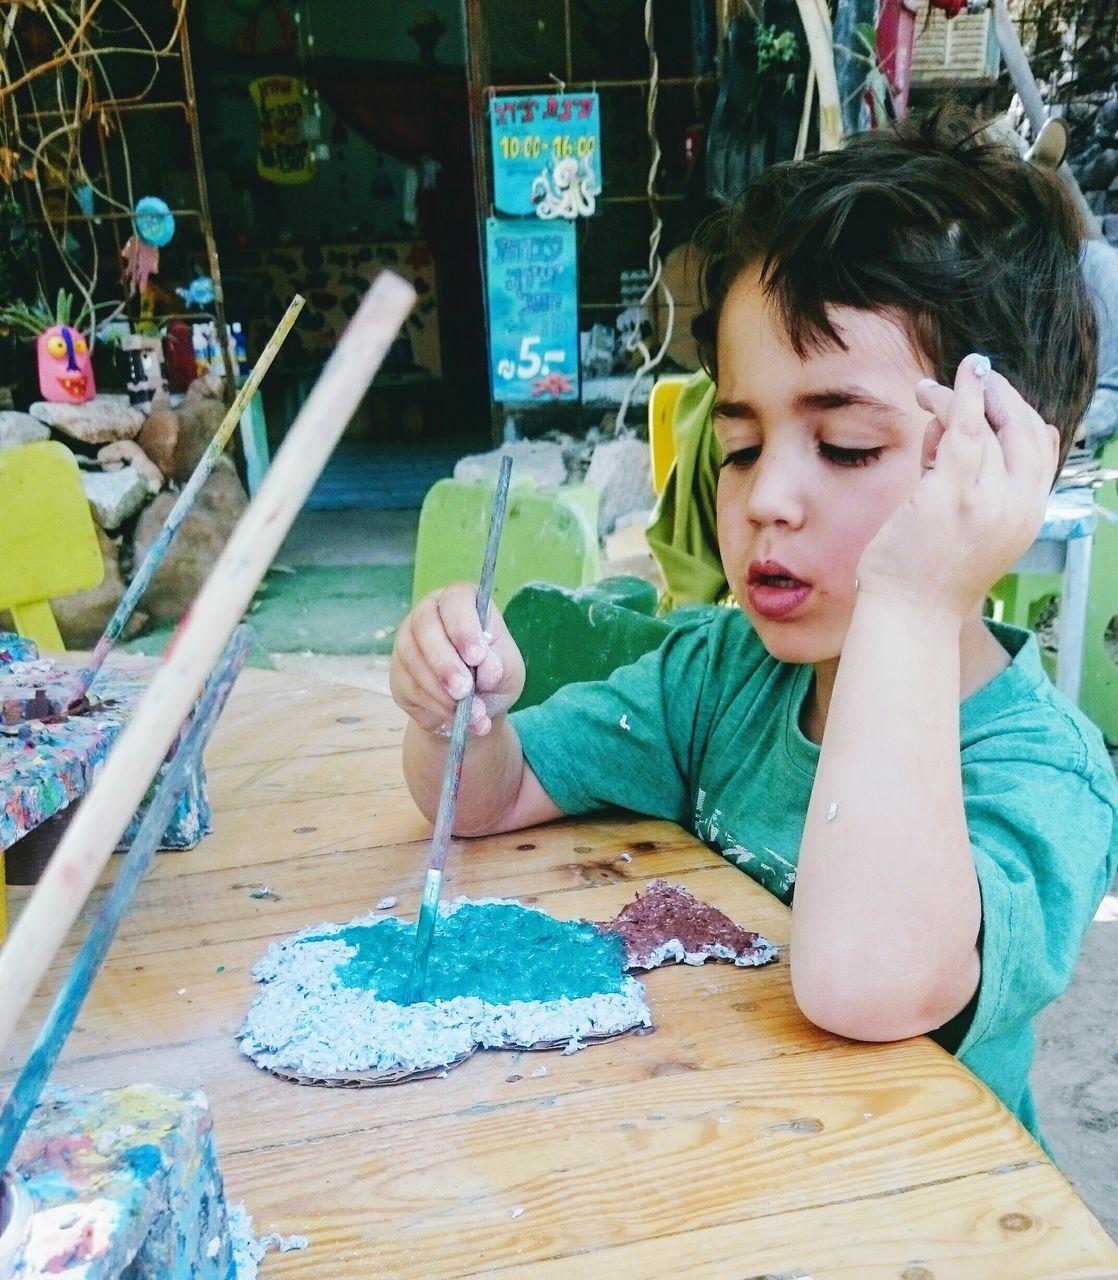 Boy Painting Artwork At Table